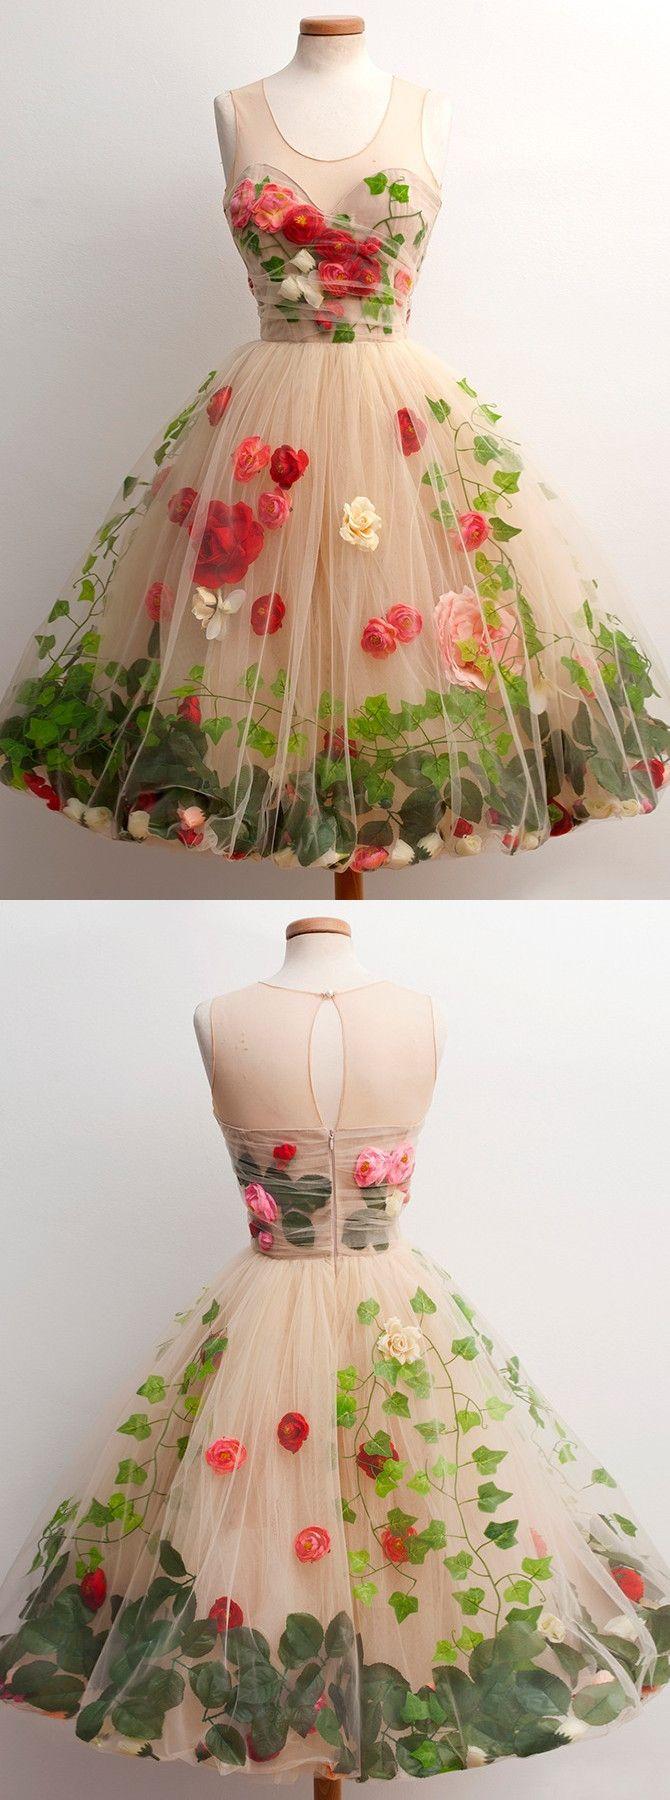 best Платья images on pinterest dresses african attire and